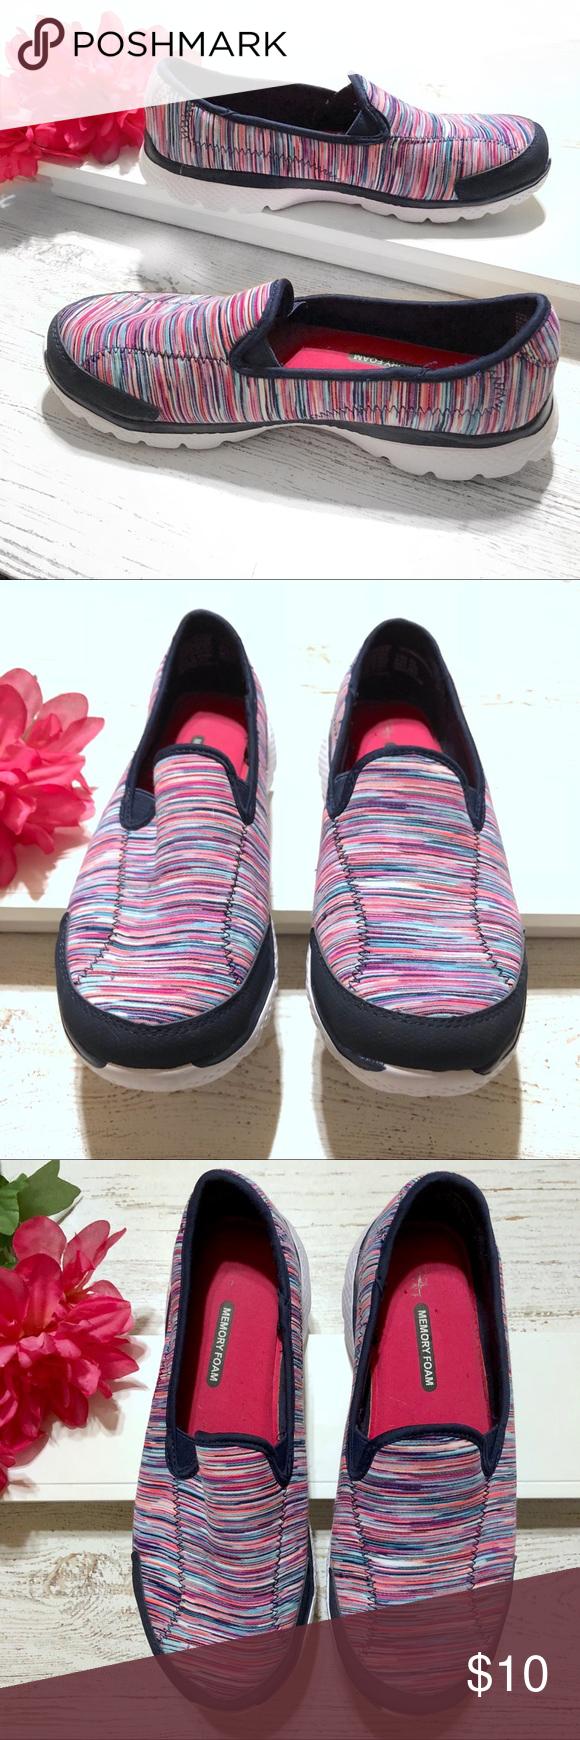 Danskin Now colorful athletic knit slip